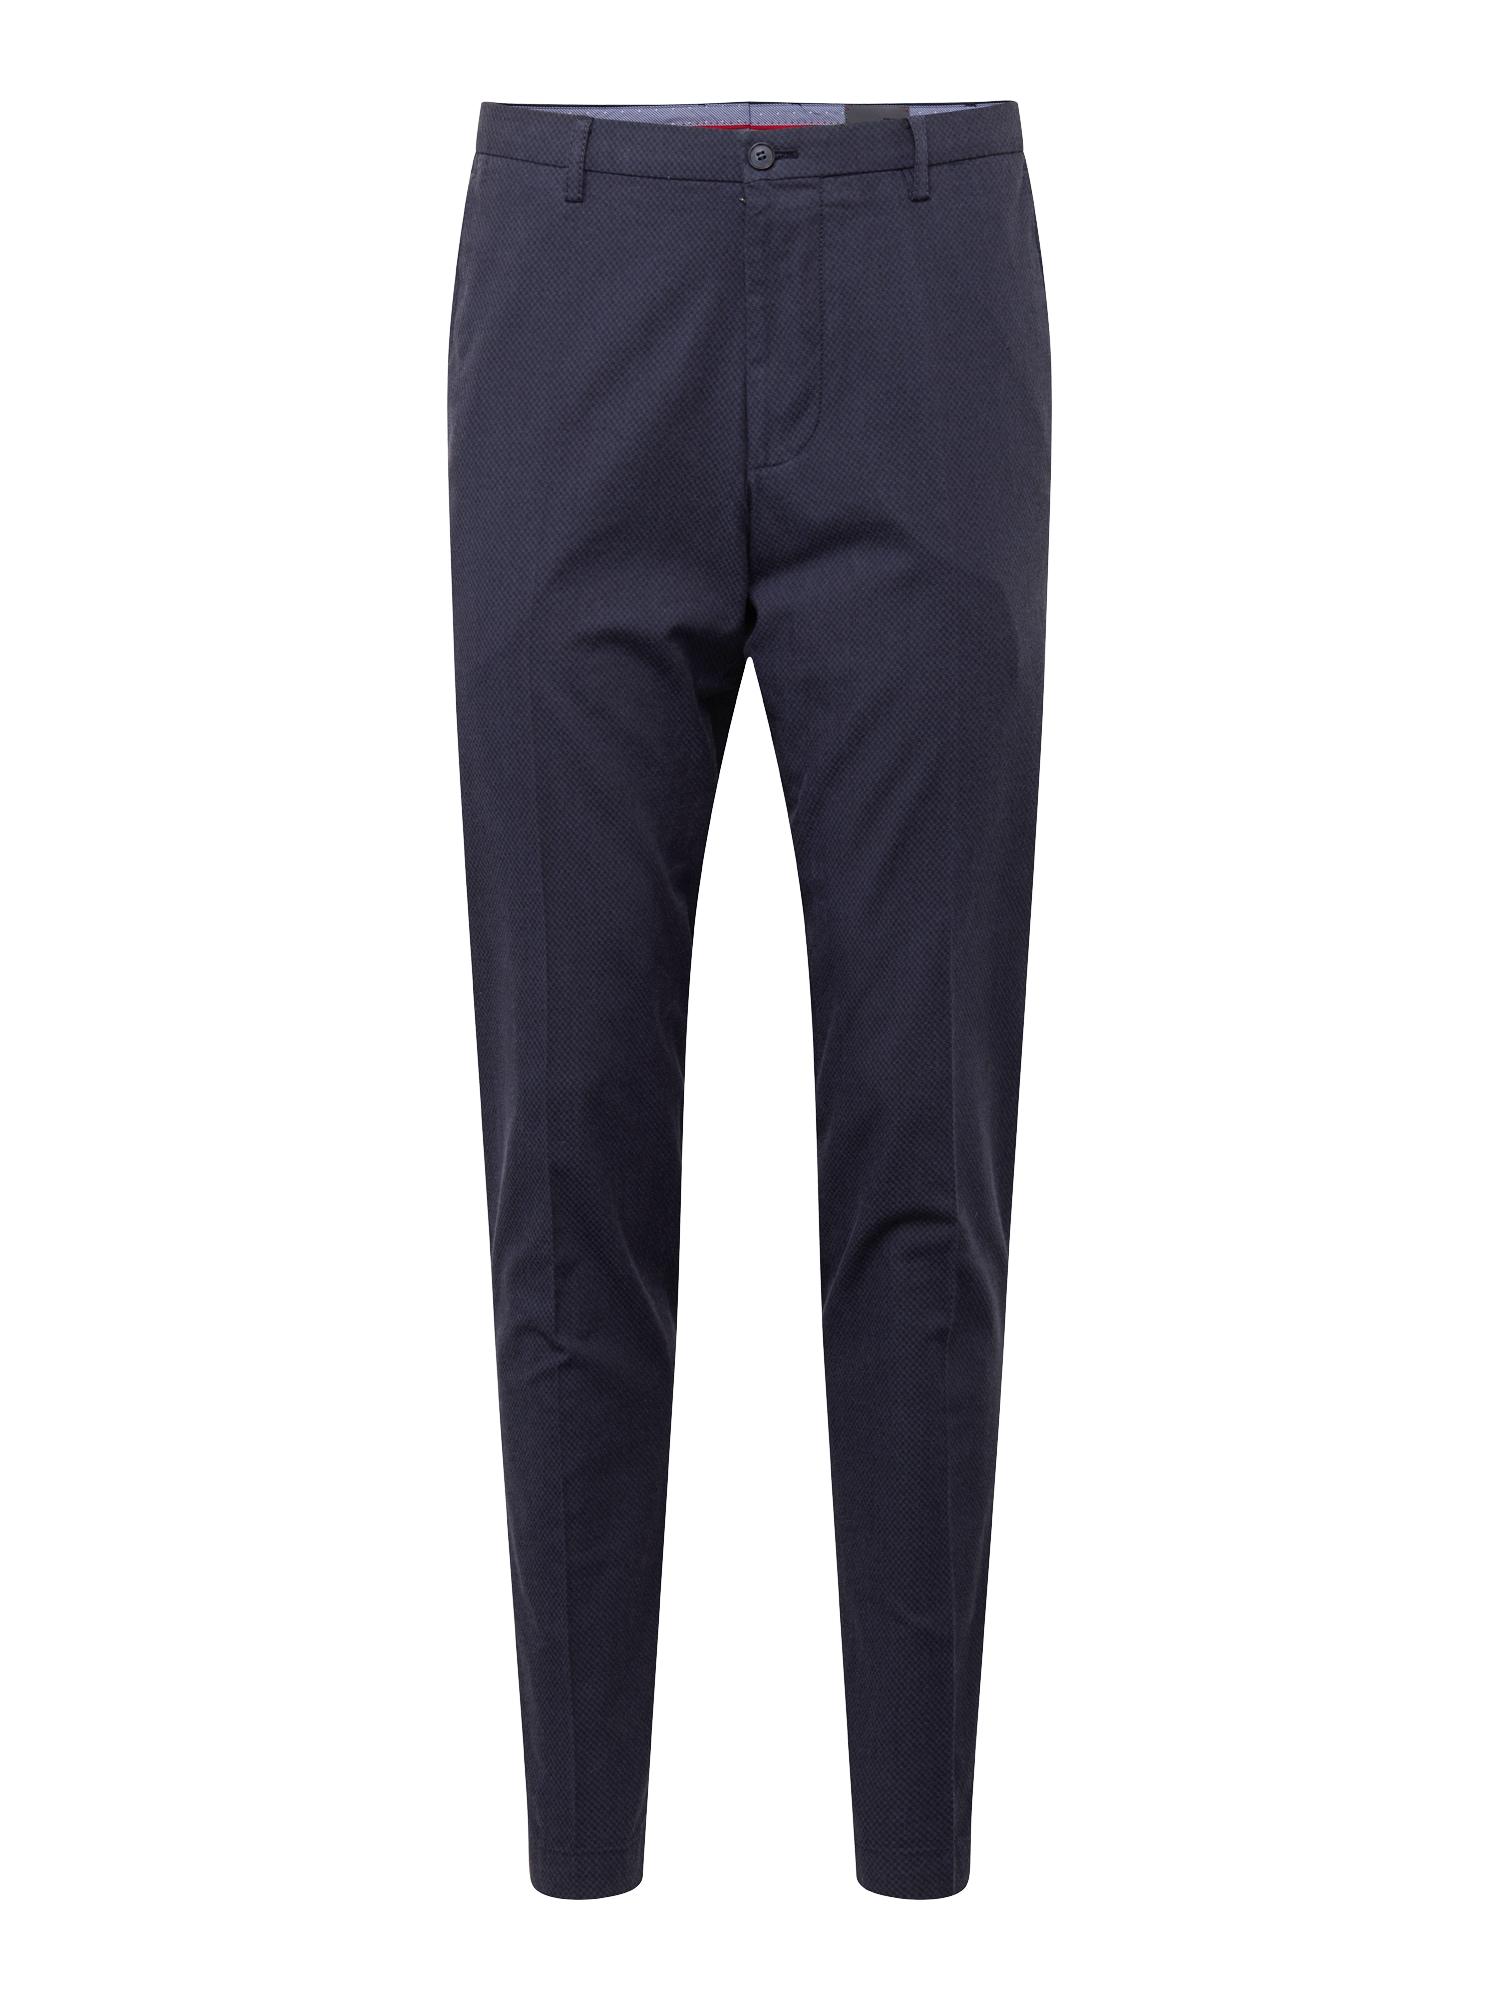 Kalhoty s puky CIBRODY tmavě modrá CINQUE